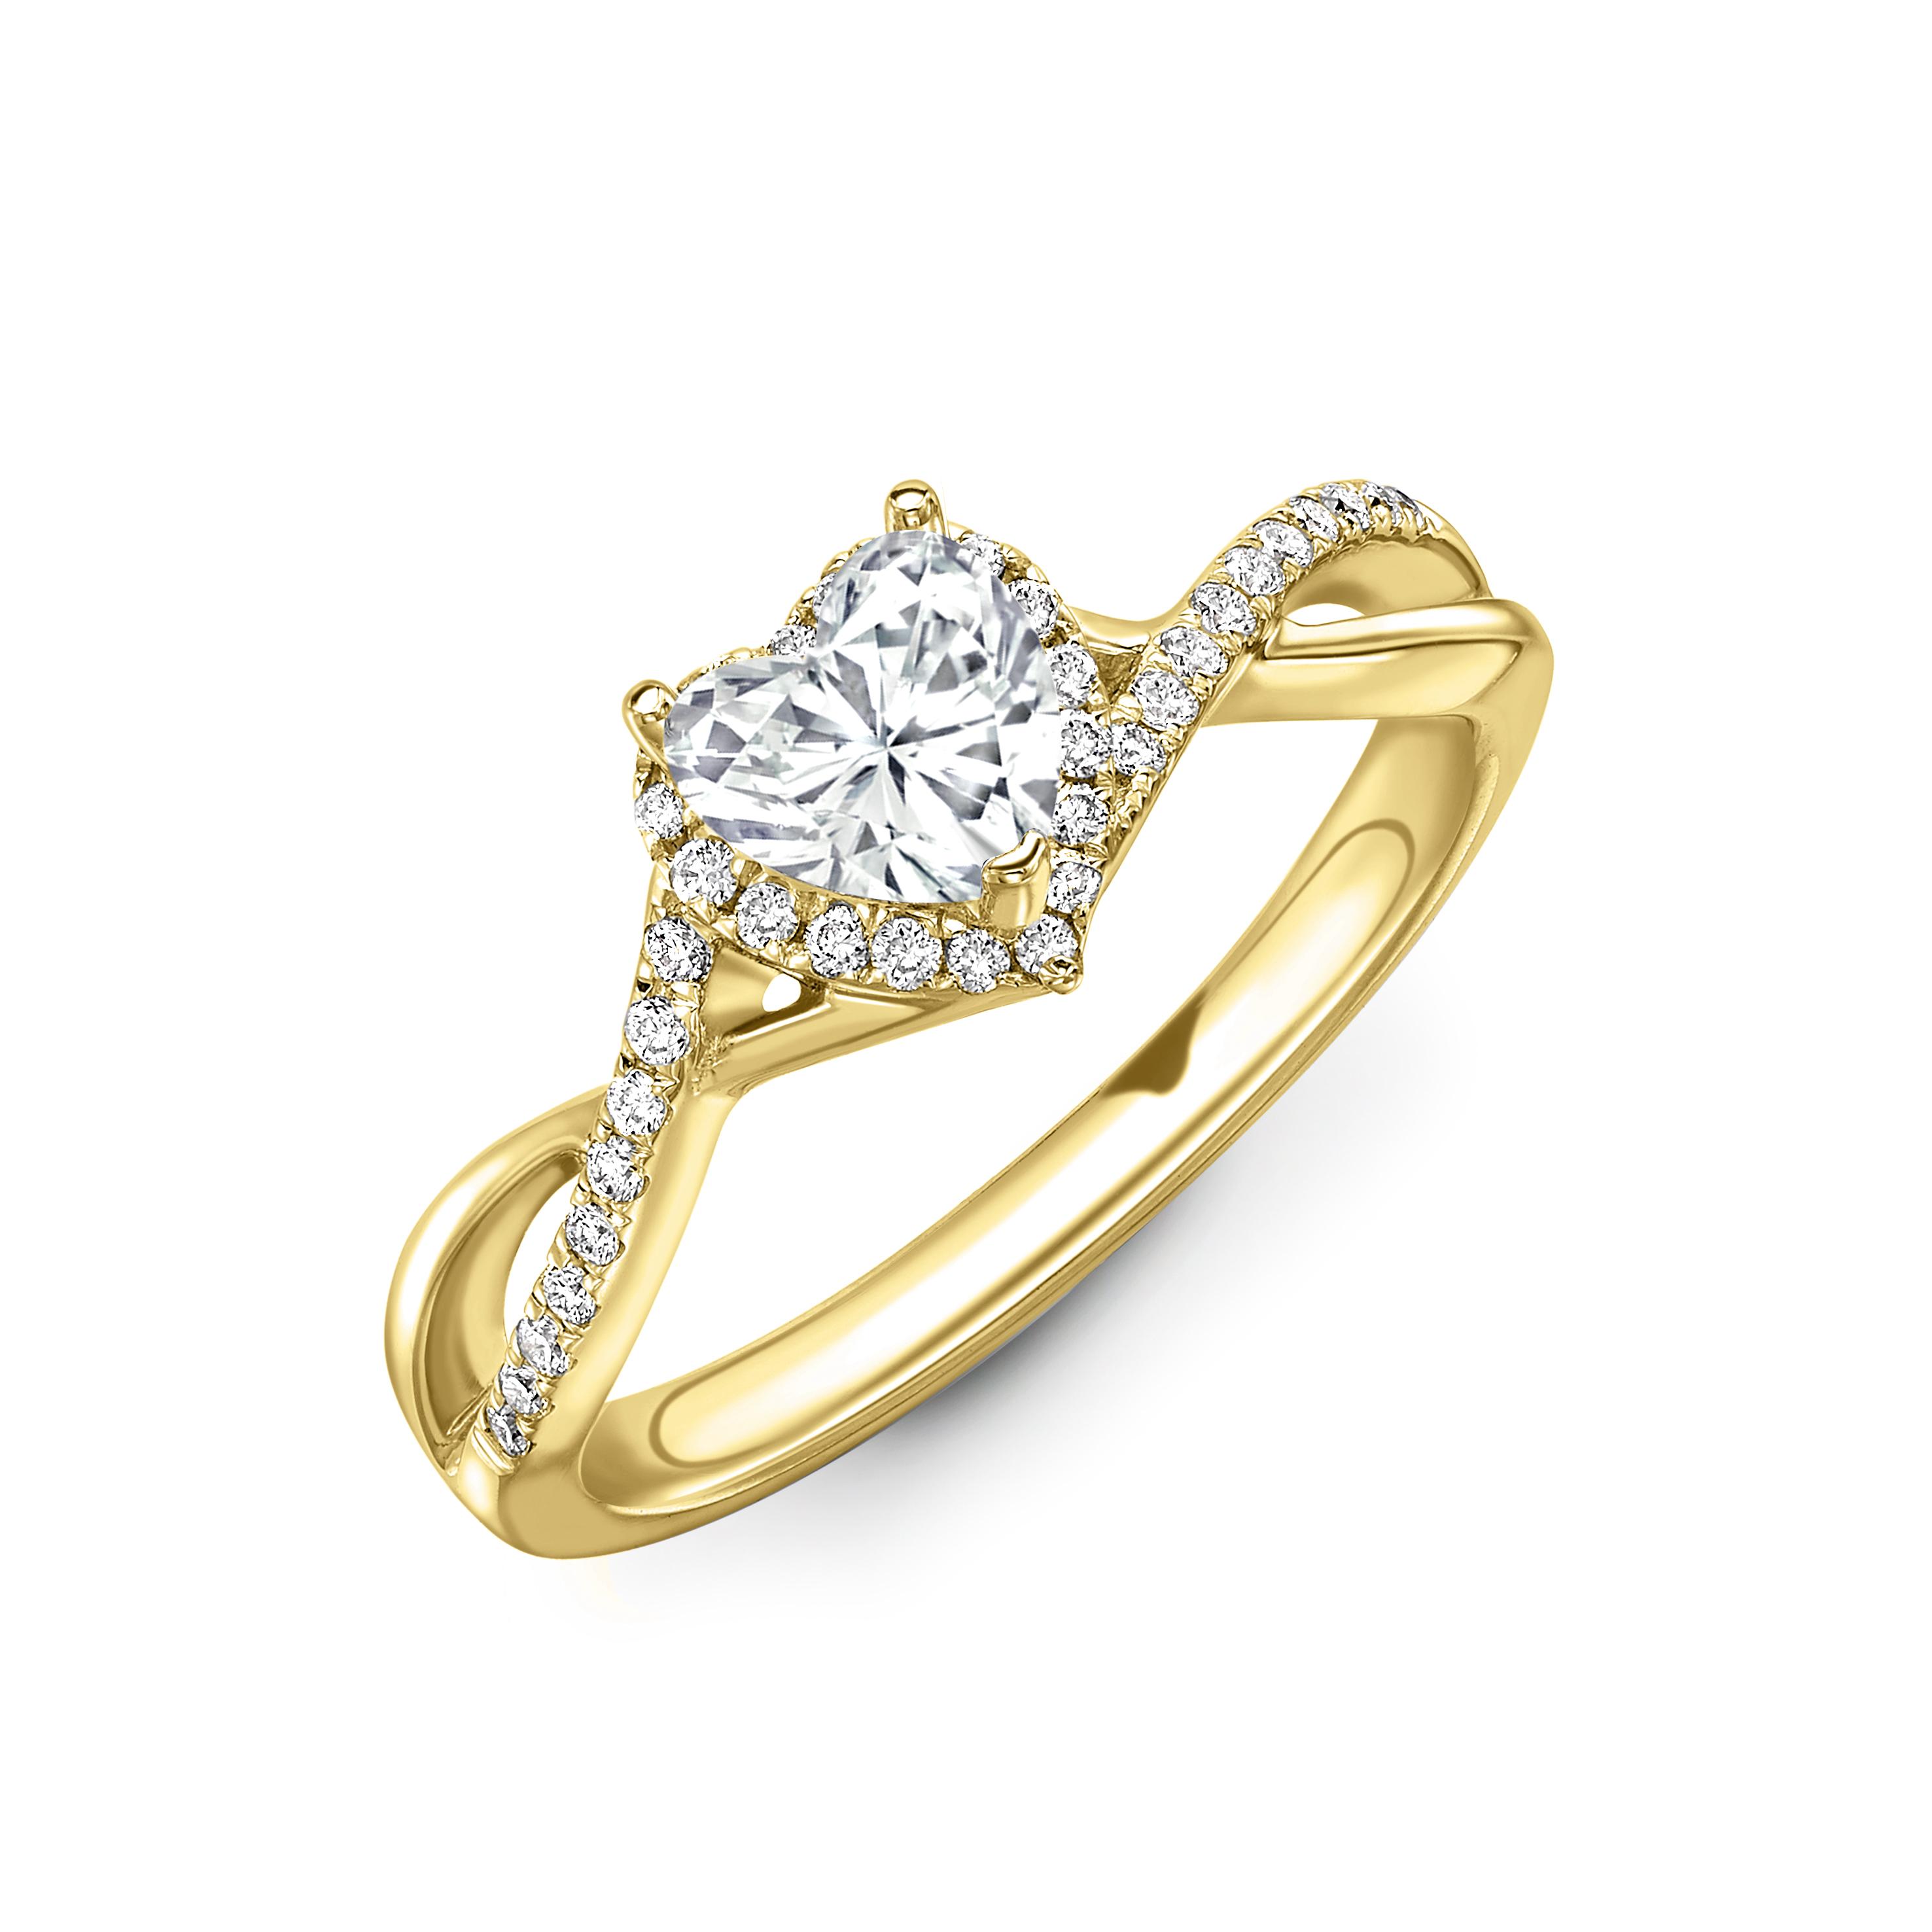 4 Prong Setting Heart Shape Intervene Shoulder Halo Diamond Engagement Rings